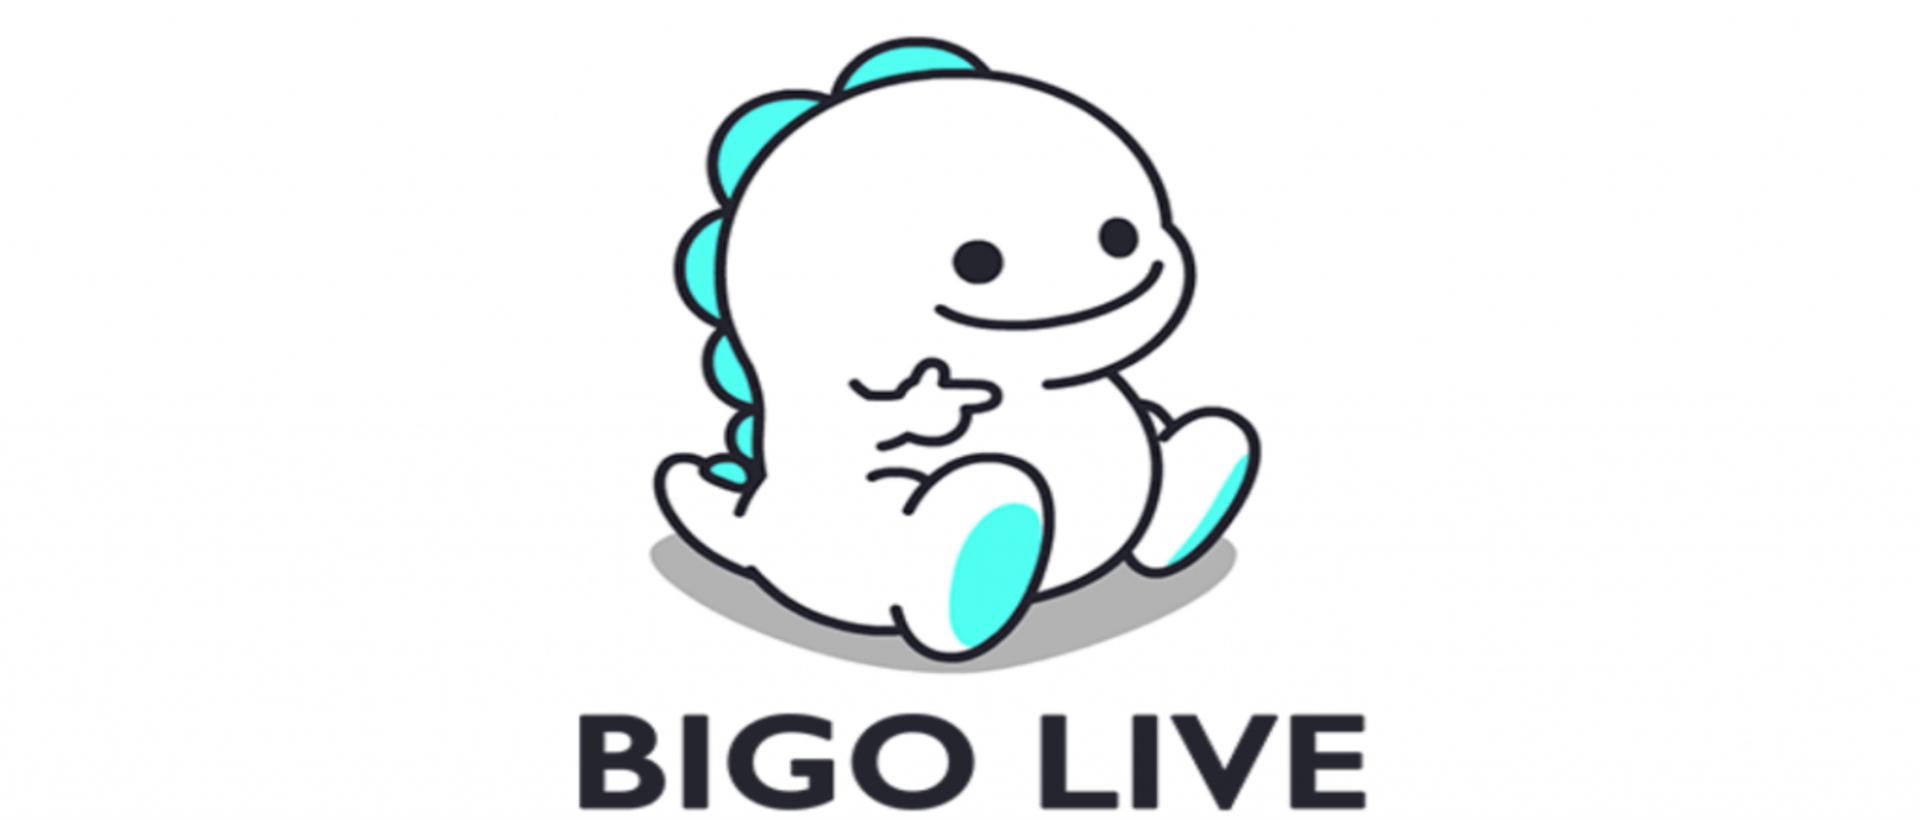 Bigo Live – Live Stream, Video & Chat Trực Tuyến